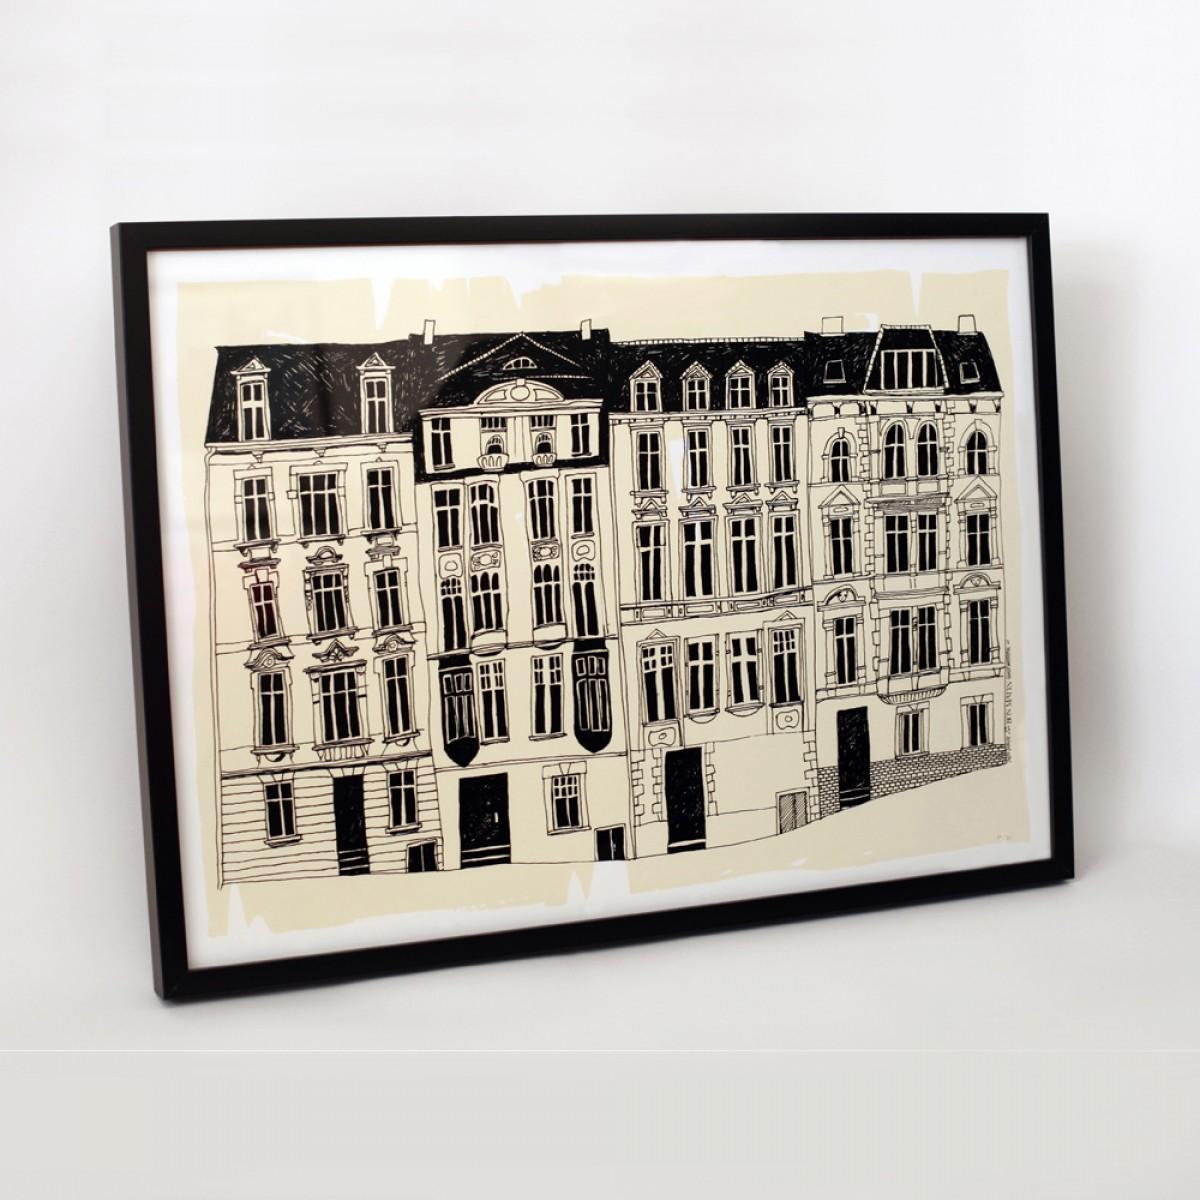 Bon Matin La Rue No. 1 Siebdruckplakat